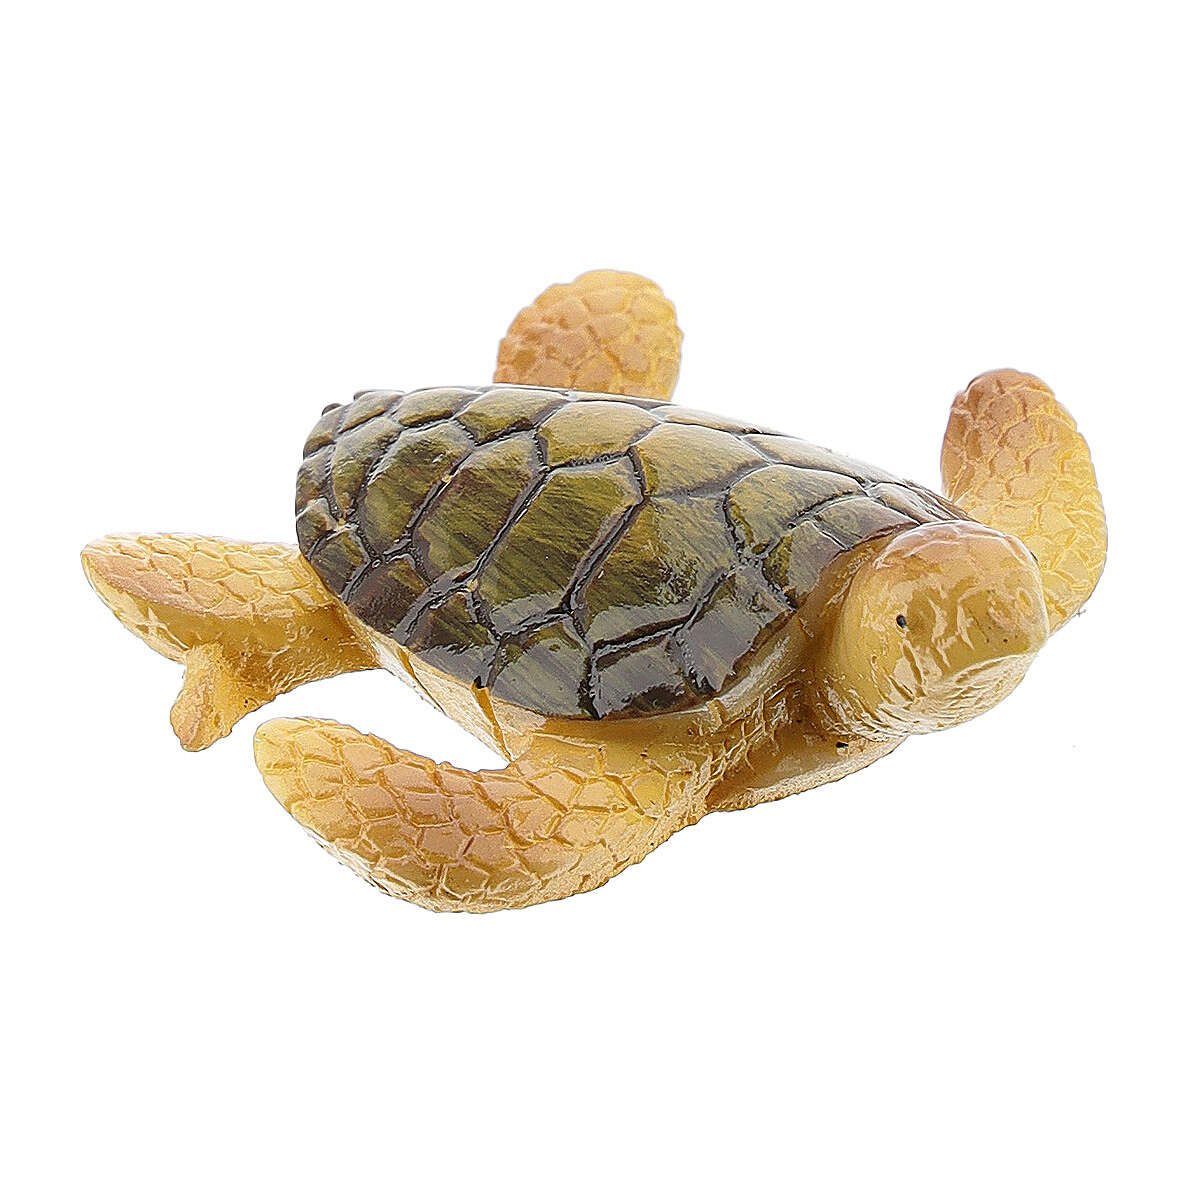 Sea turtle resin Nativity Scene with 8-10 cm figurines 3